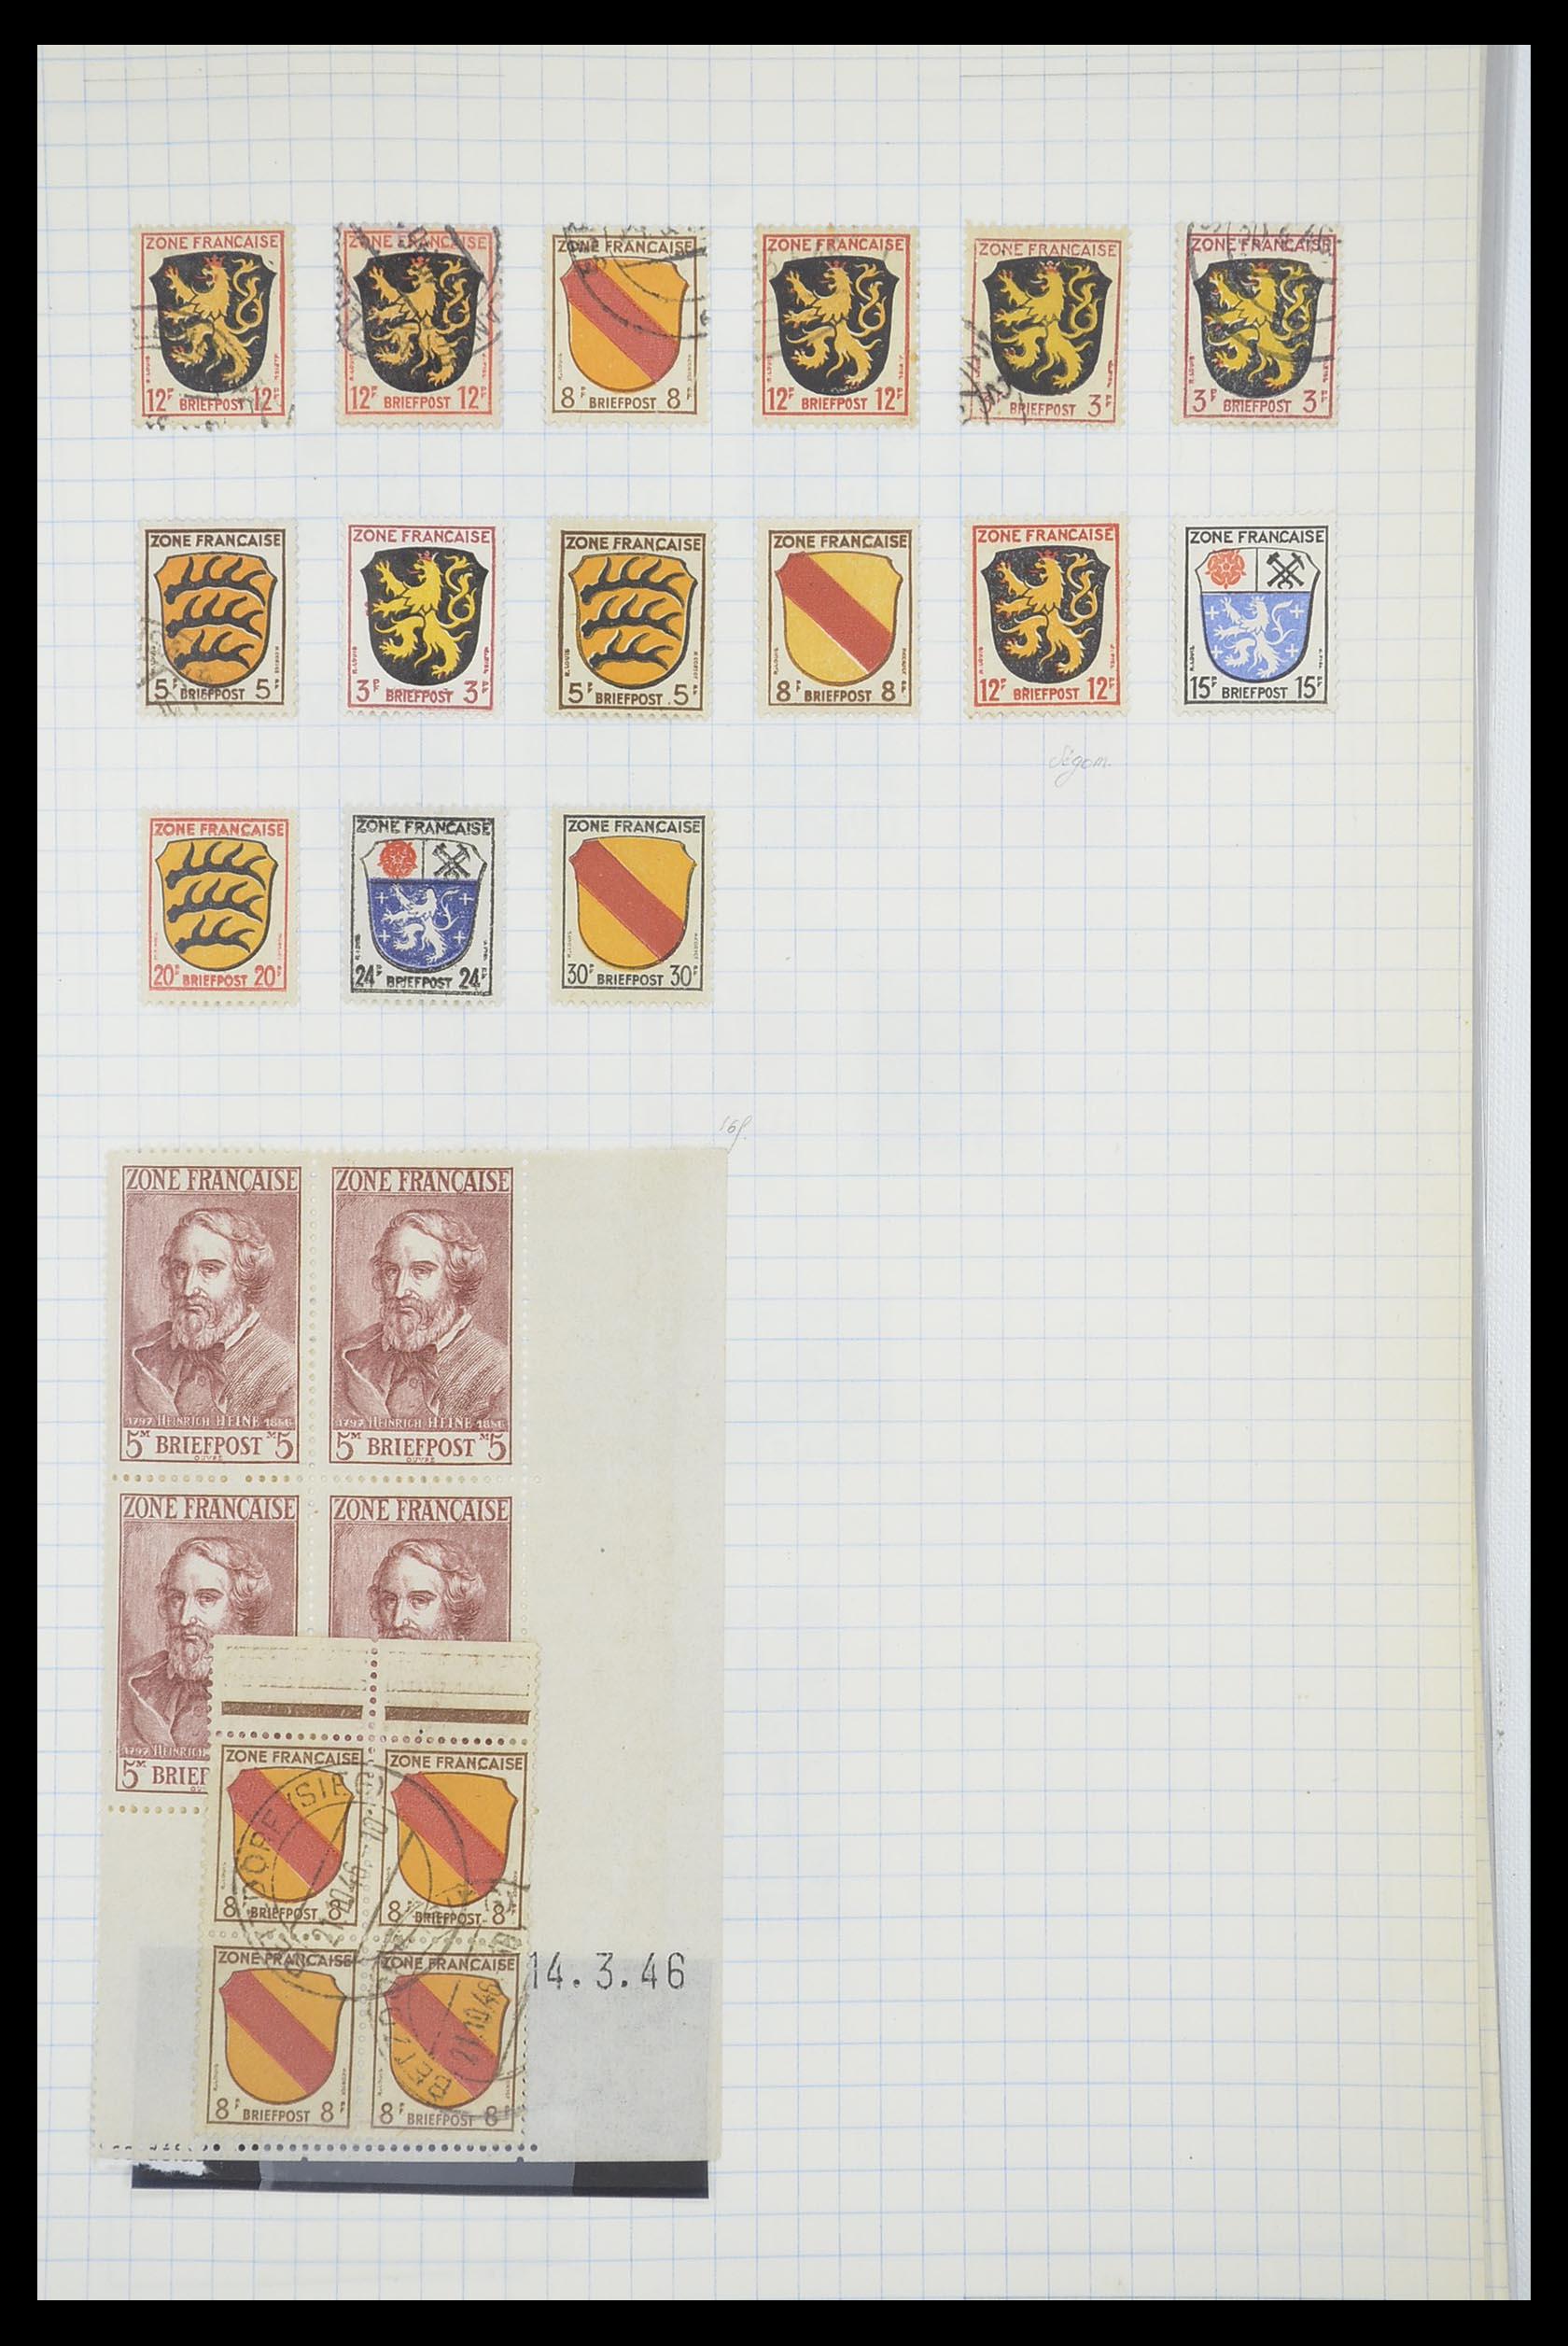 33864 004 - Postzegelverzameling 33864 Franse Zone 1945-1949.